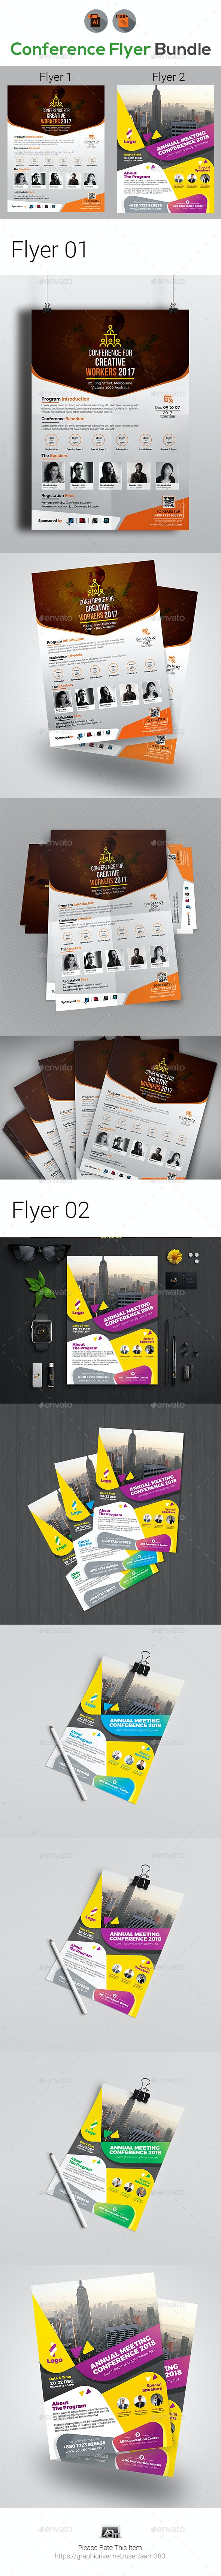 Conference Flyer Bundle - Events Flyers